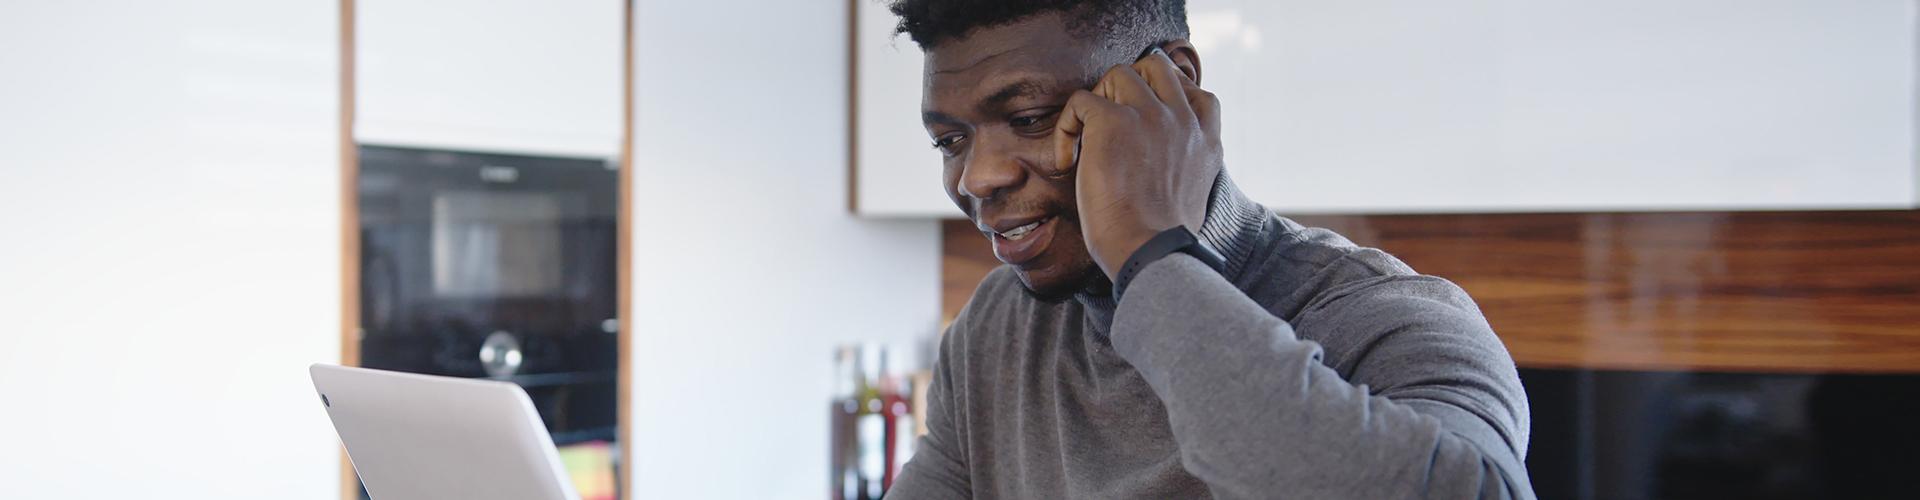 a man answering phone calls